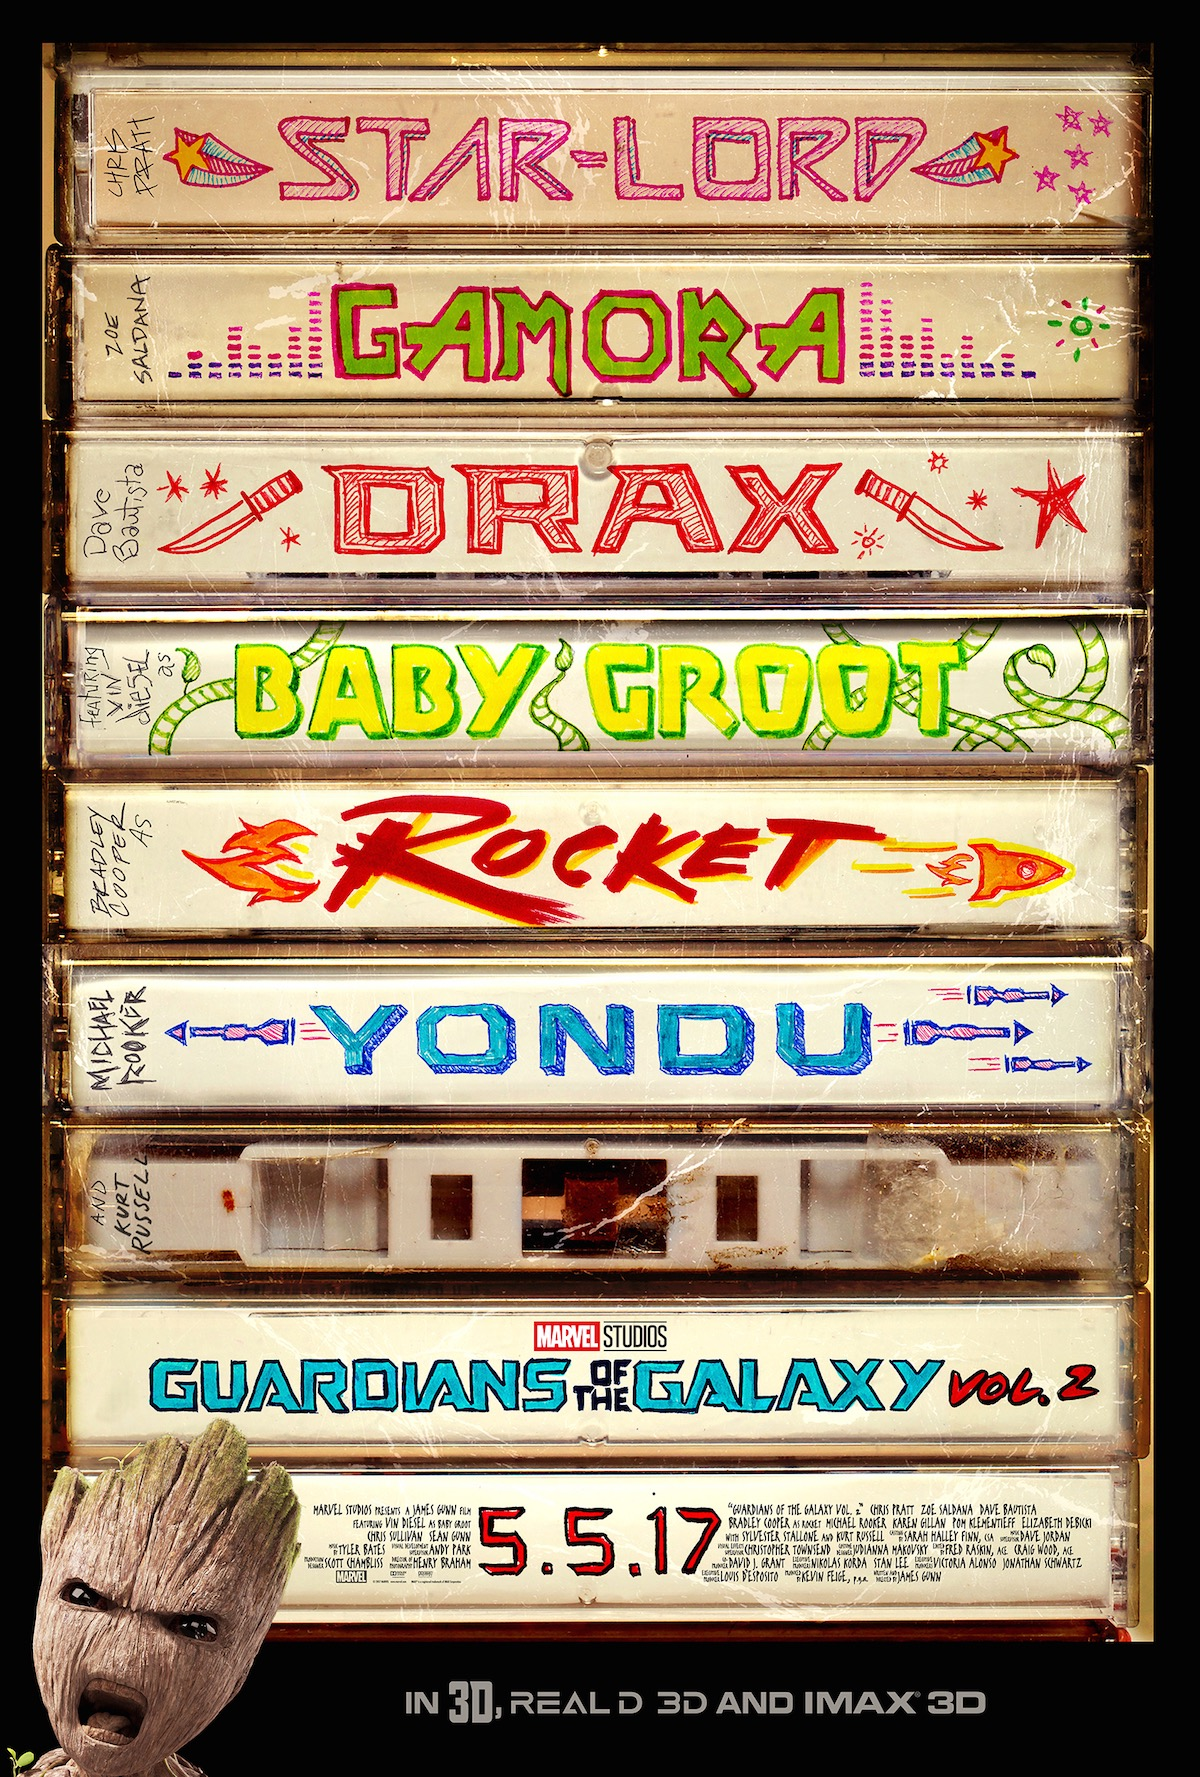 Guardiand of the Galaxy Vol 2 Spot & Plakat